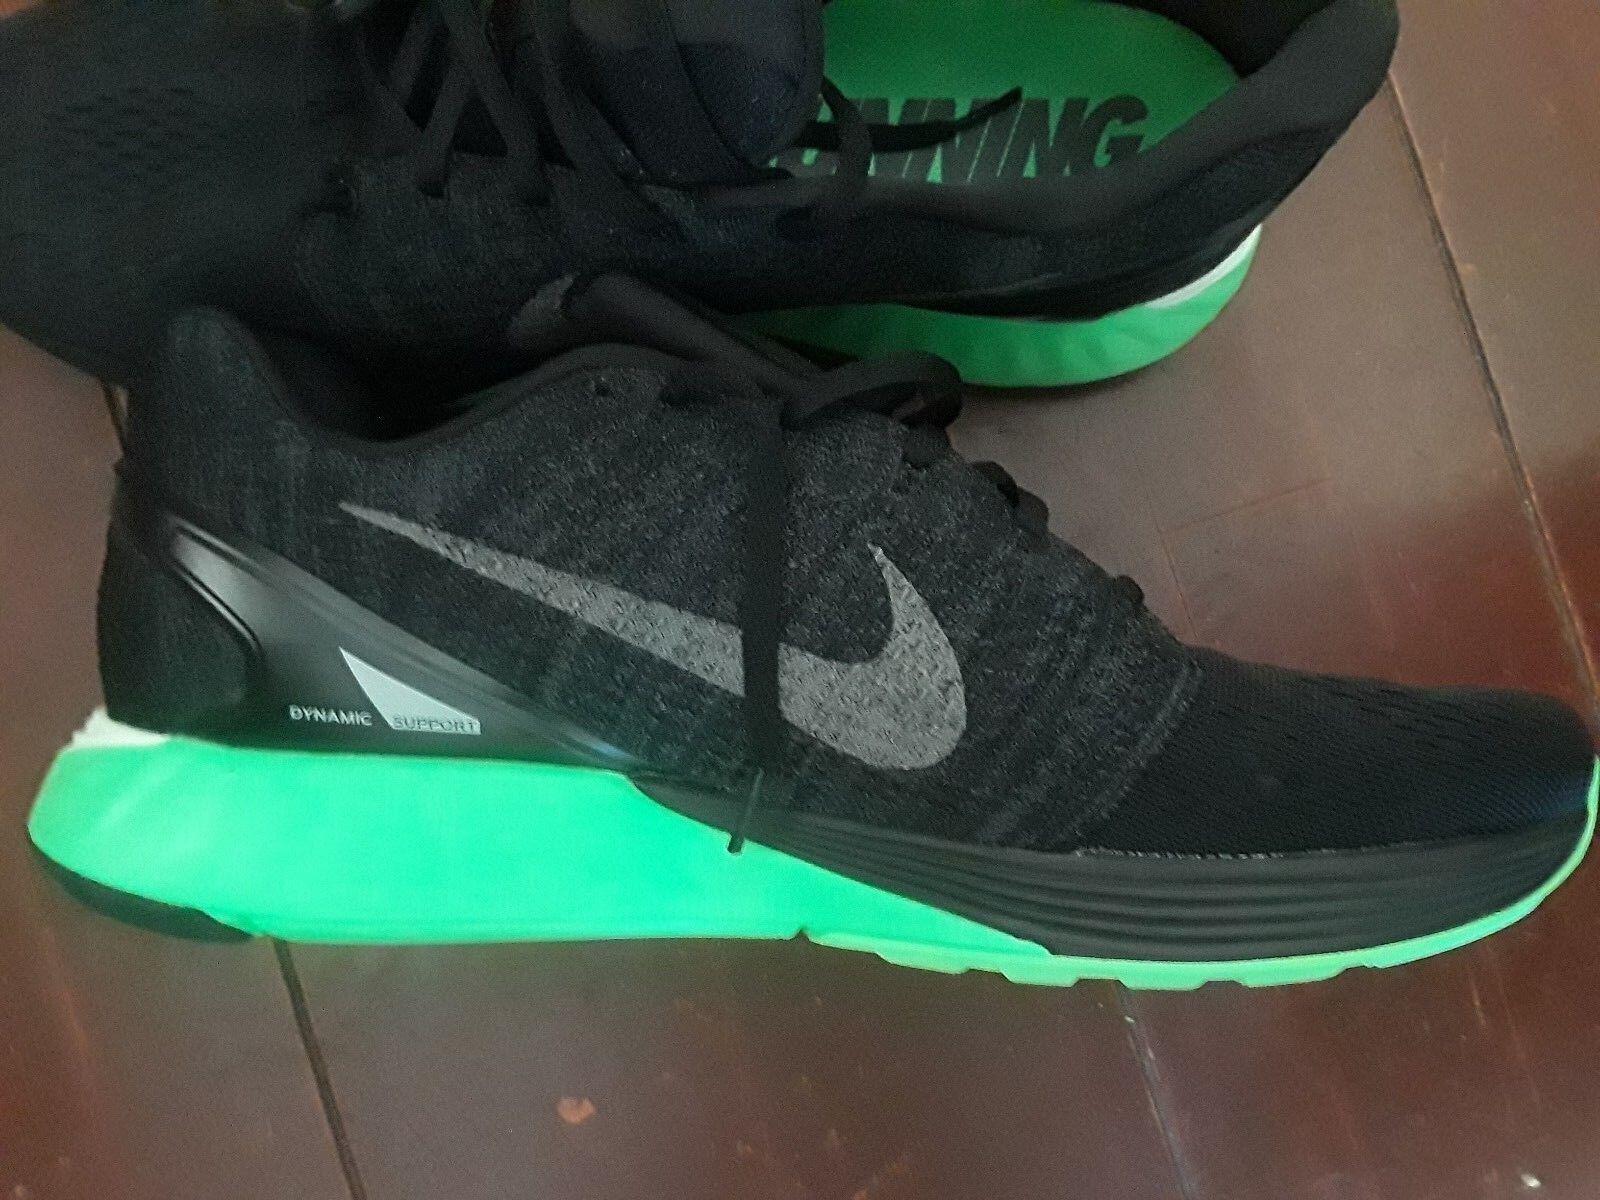 NEW Uomo NIKE LUNARLON RUNNING scarpe verde STABLE RIDE SOFT  nero   SOFT 7c378c